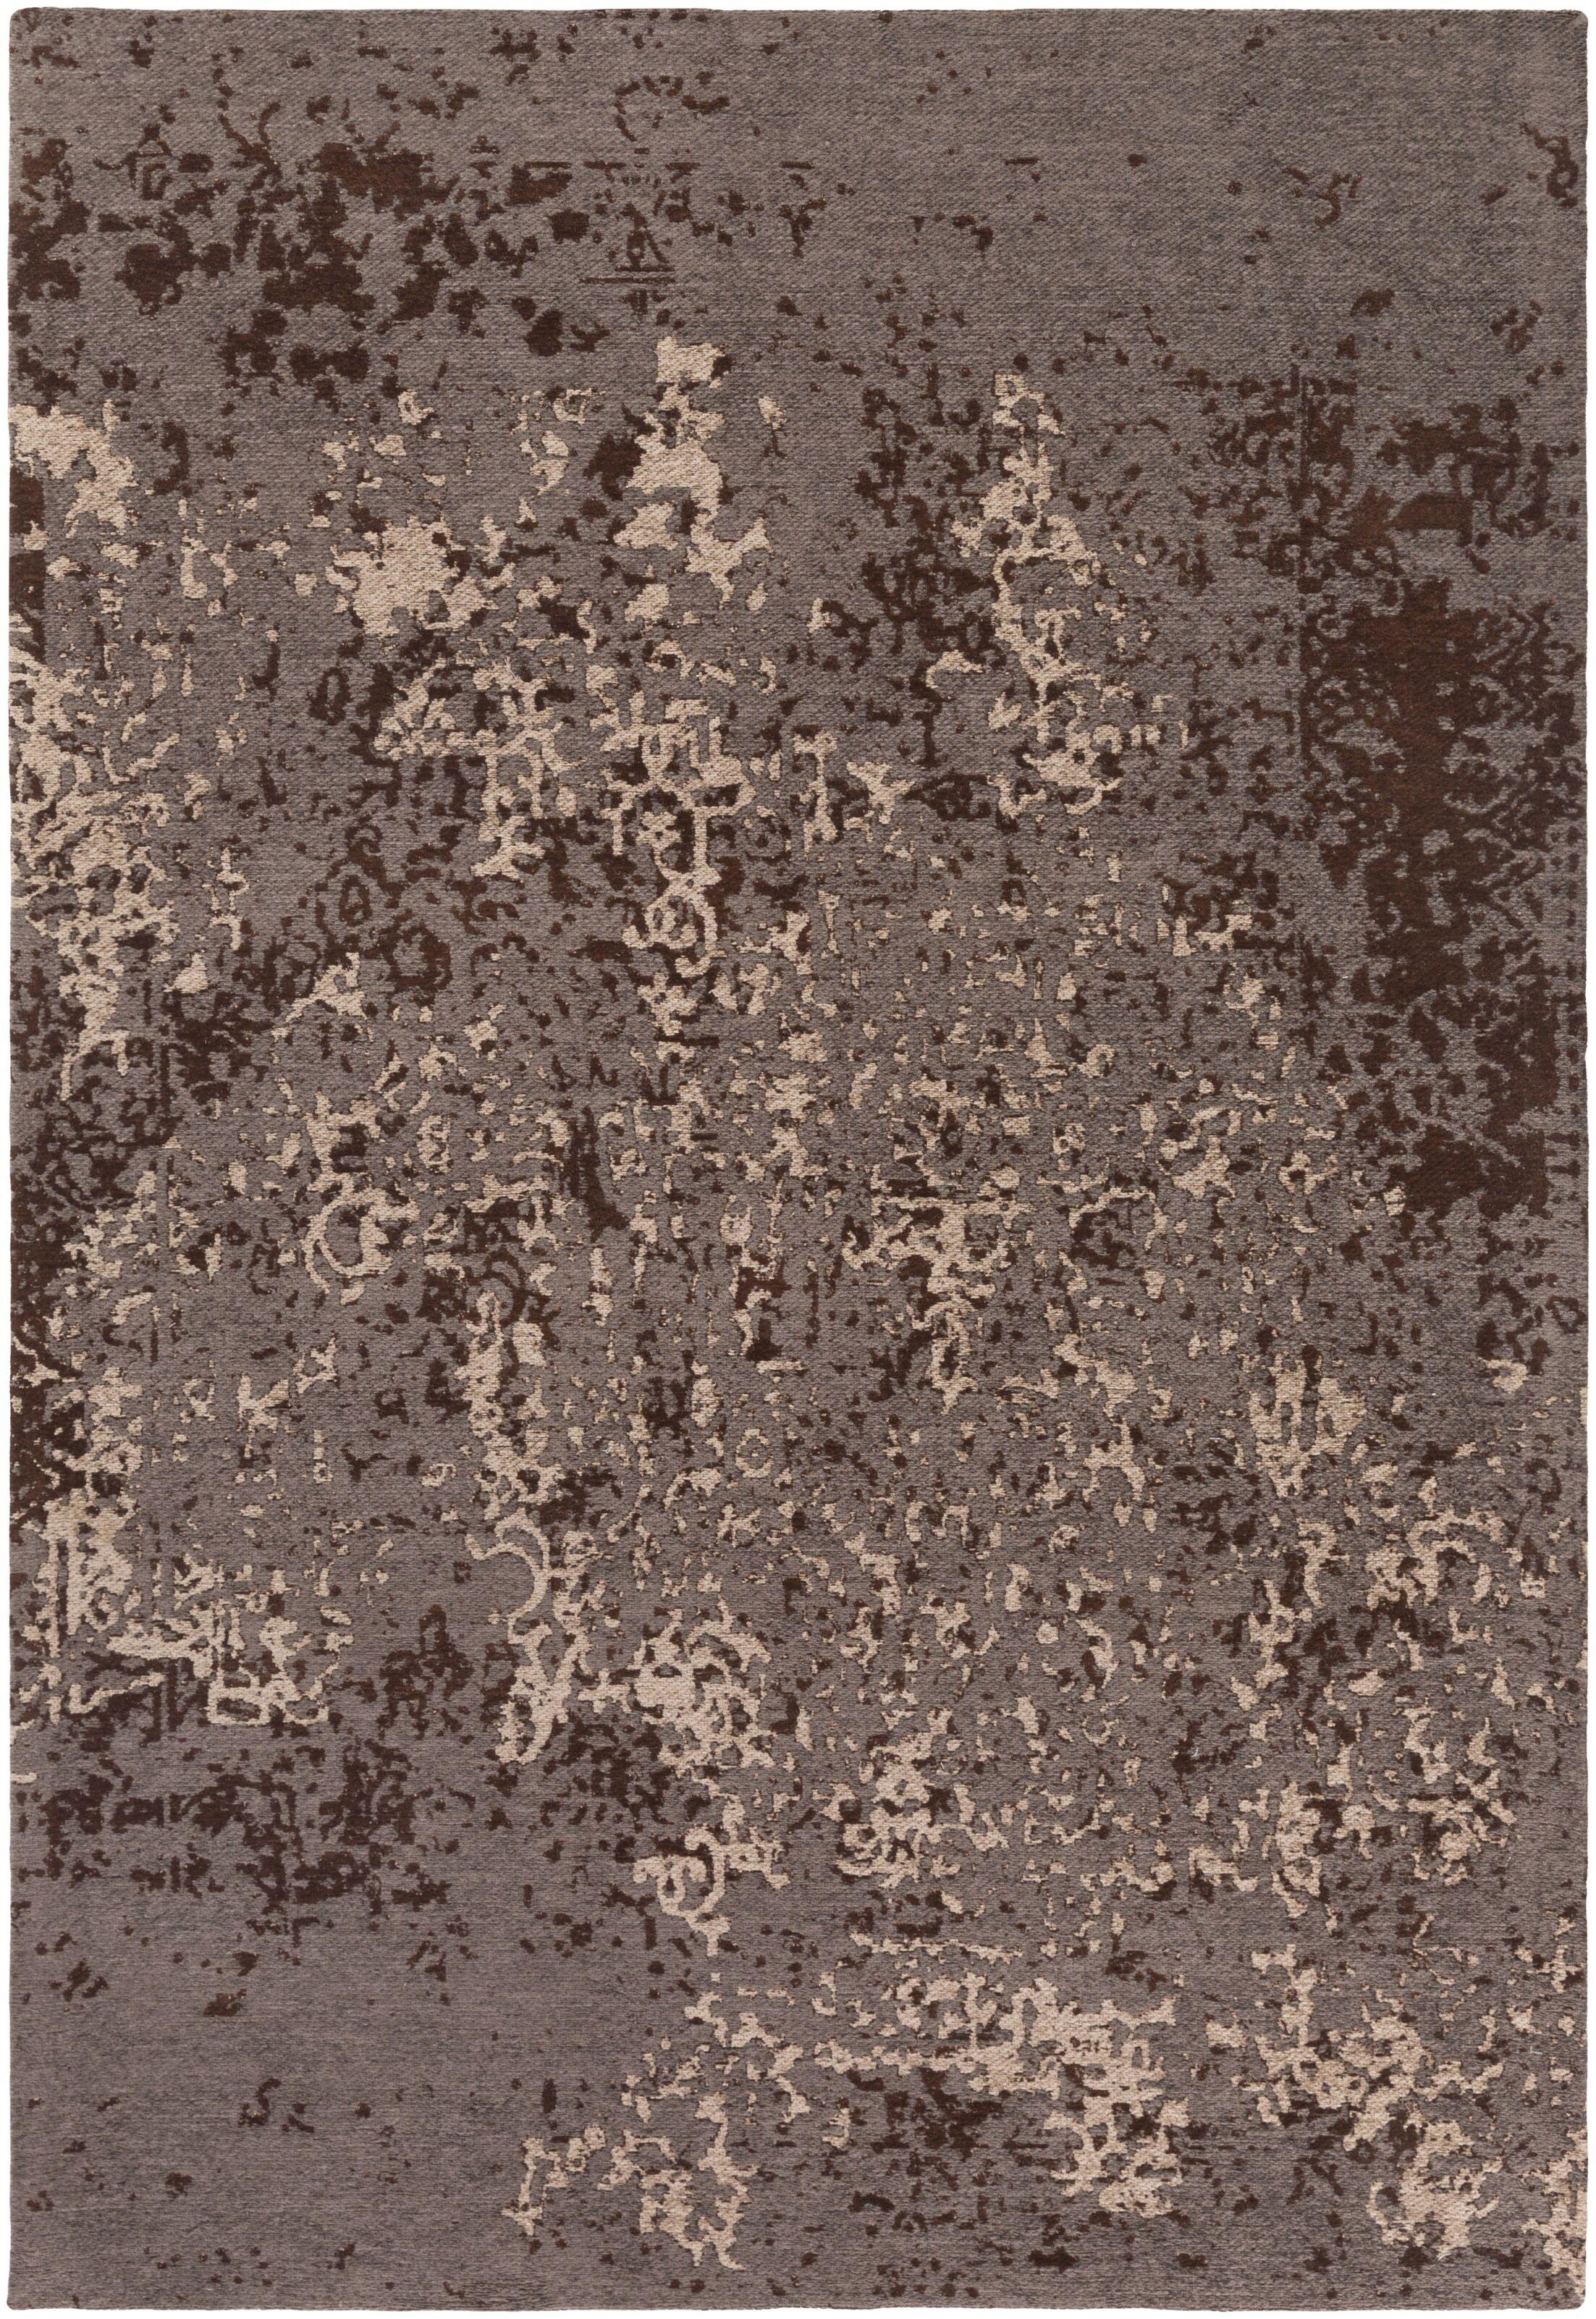 Detrick Gray/Brown Area Rug Rug Size: Rectangle 4' x 6'